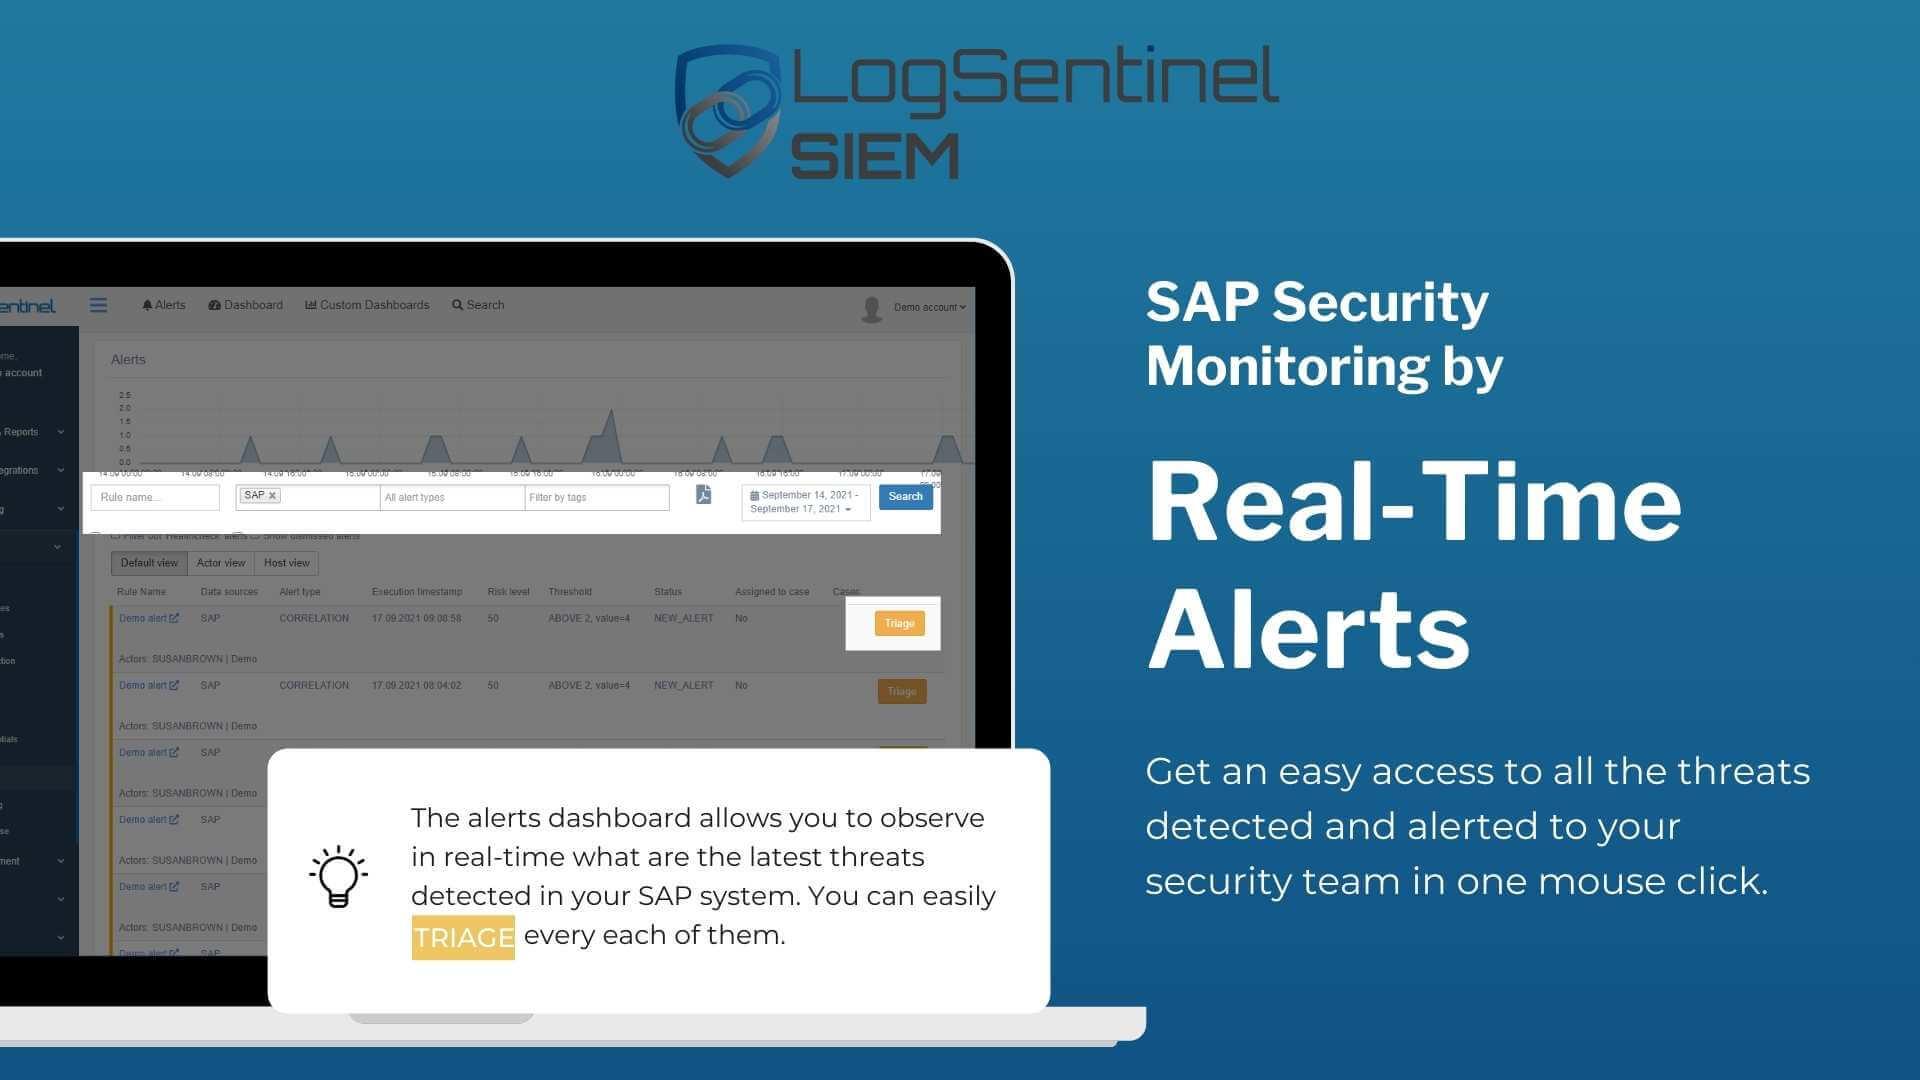 Real-time alert triaging